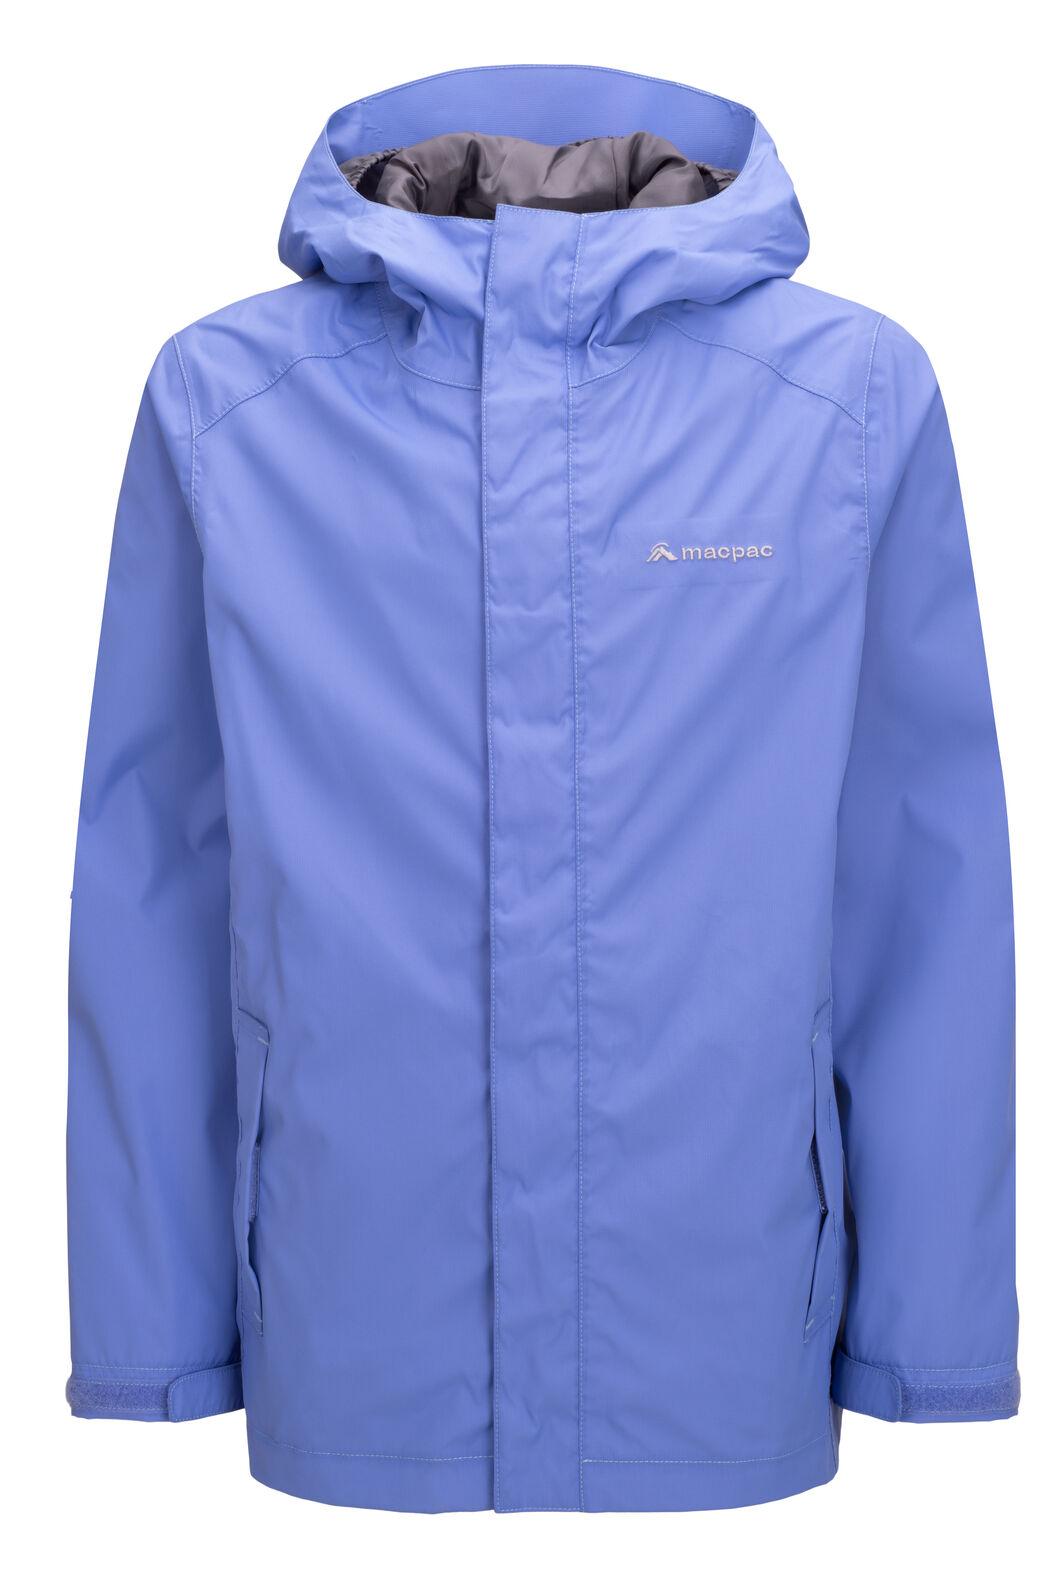 Macpac Jetstream Rain Jacket — Kids', Wedgewood, hi-res